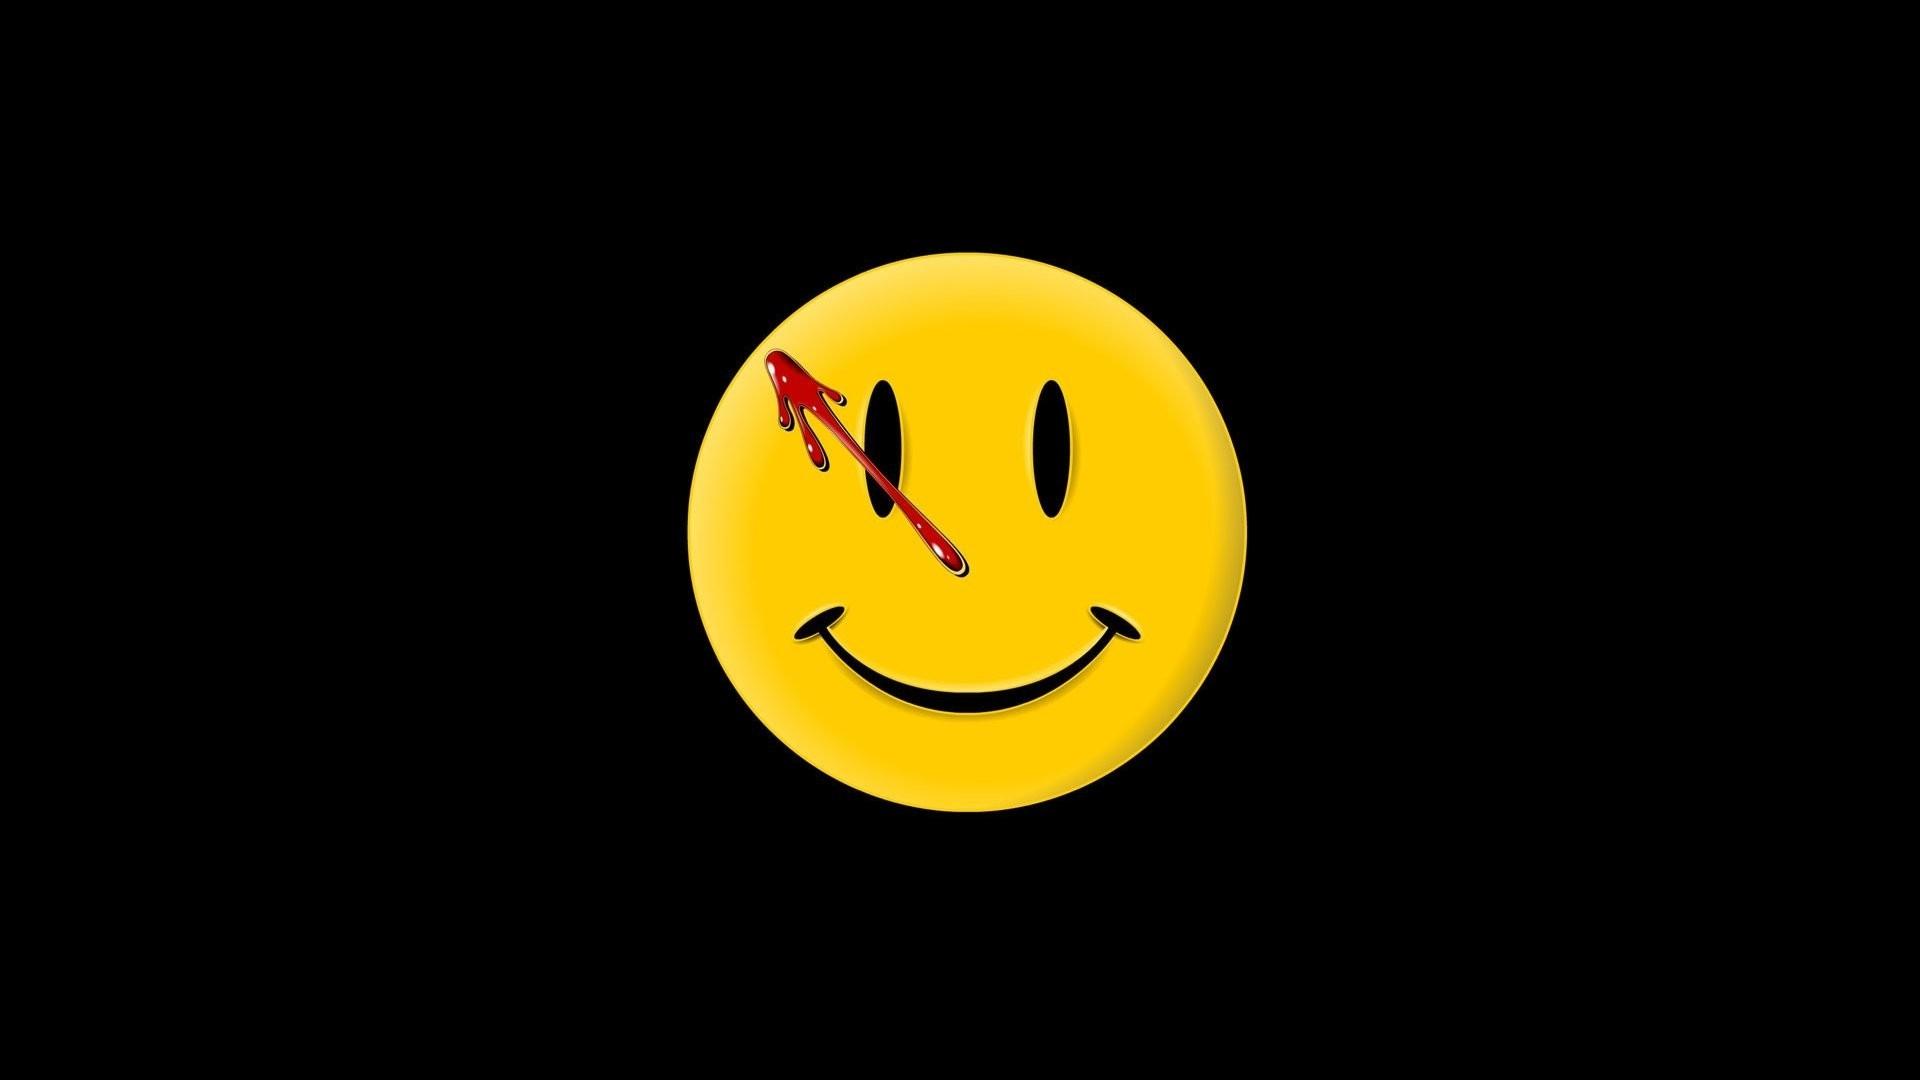 screenheaven: watchmen black background smiley face desktop and